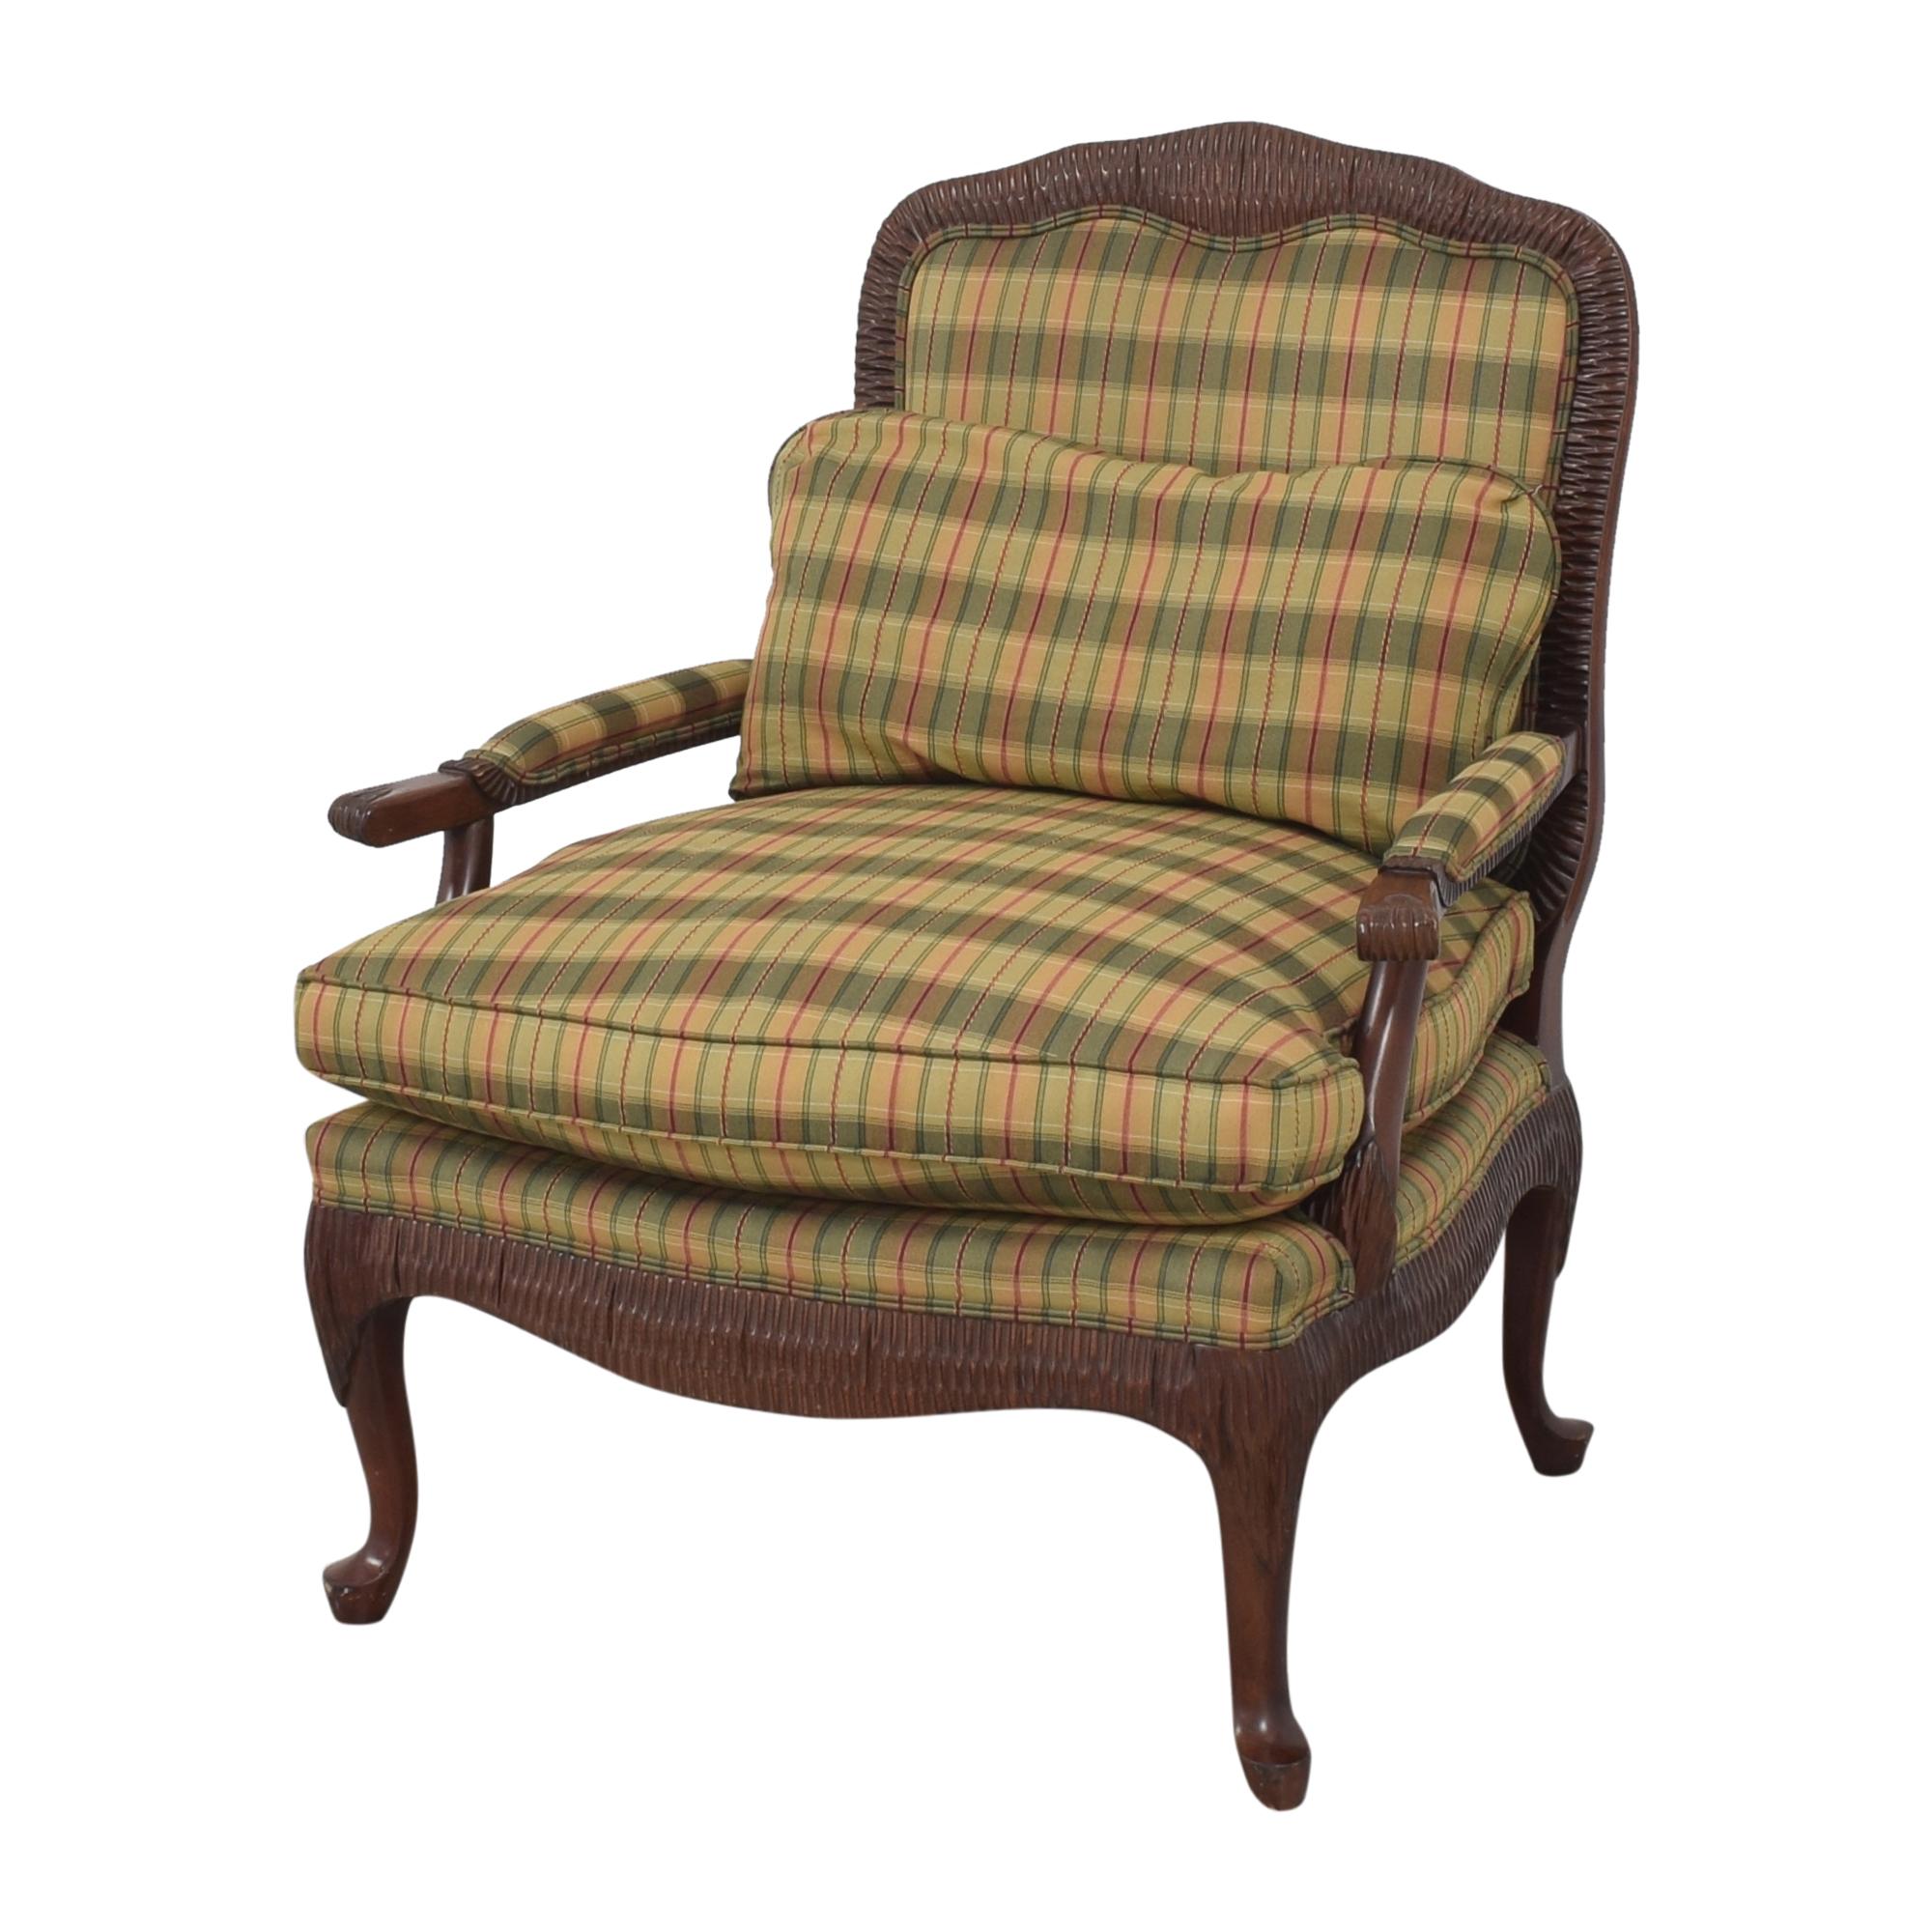 Lexington Furniture Lexington Furniture Upholstered Accent Chair ma